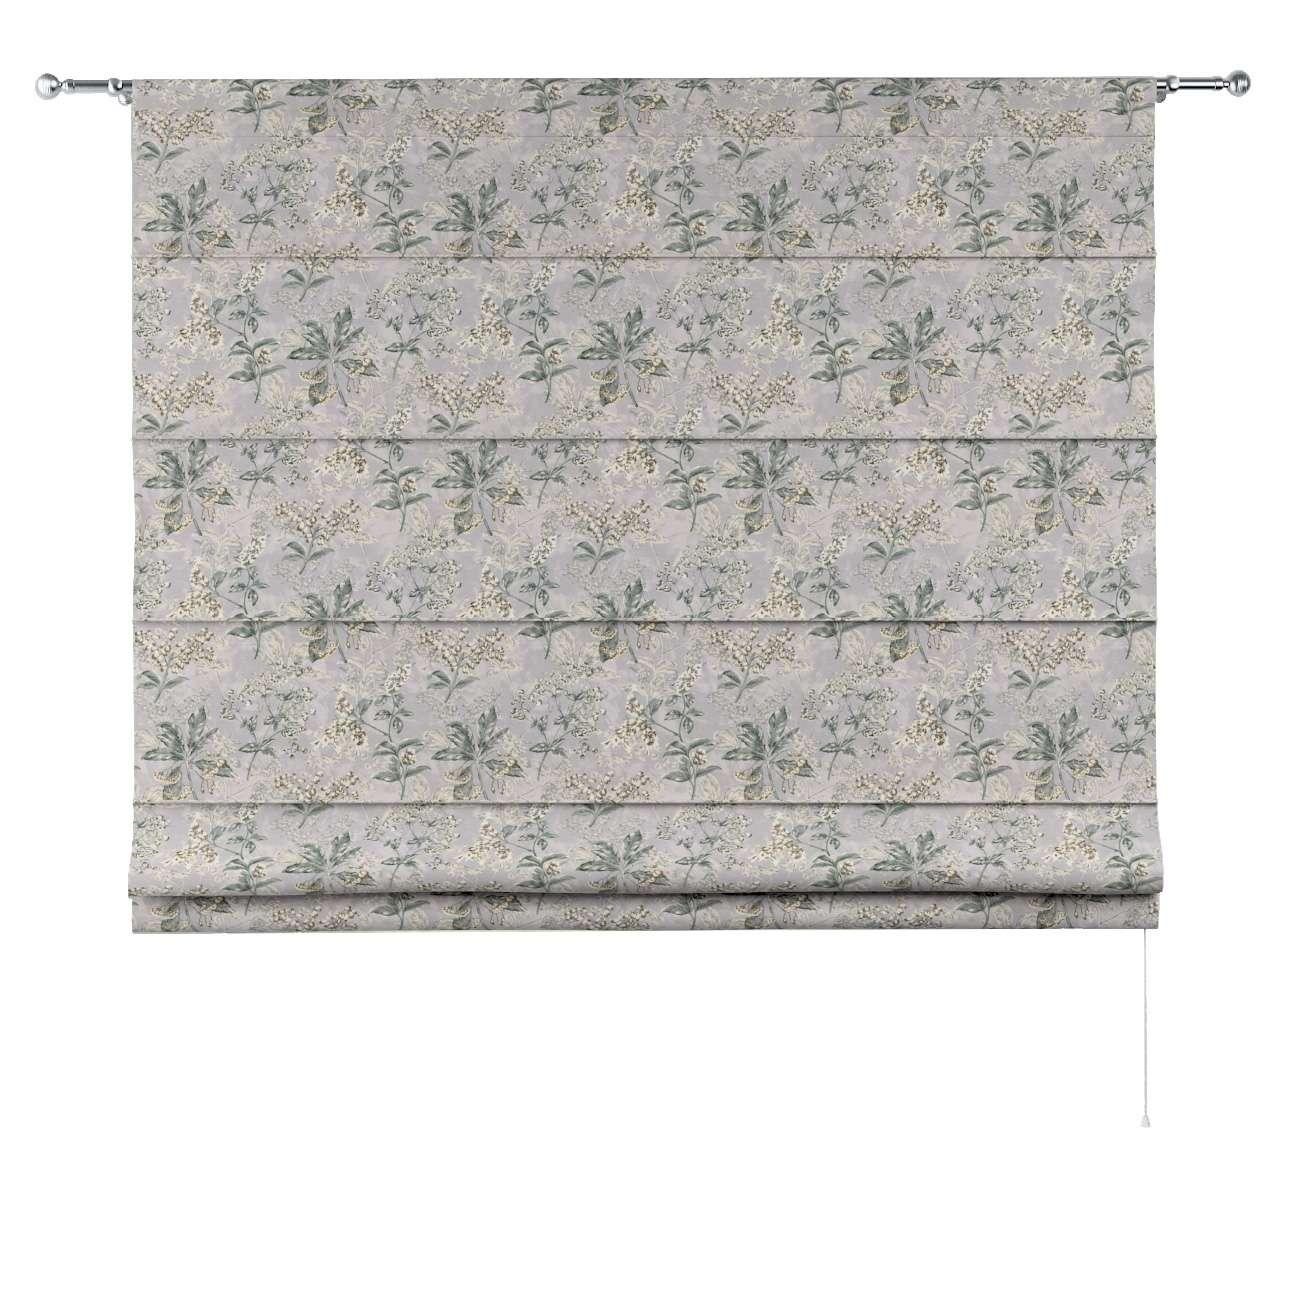 Rímska roleta Torino V kolekcii Londres, tkanina: 143-37